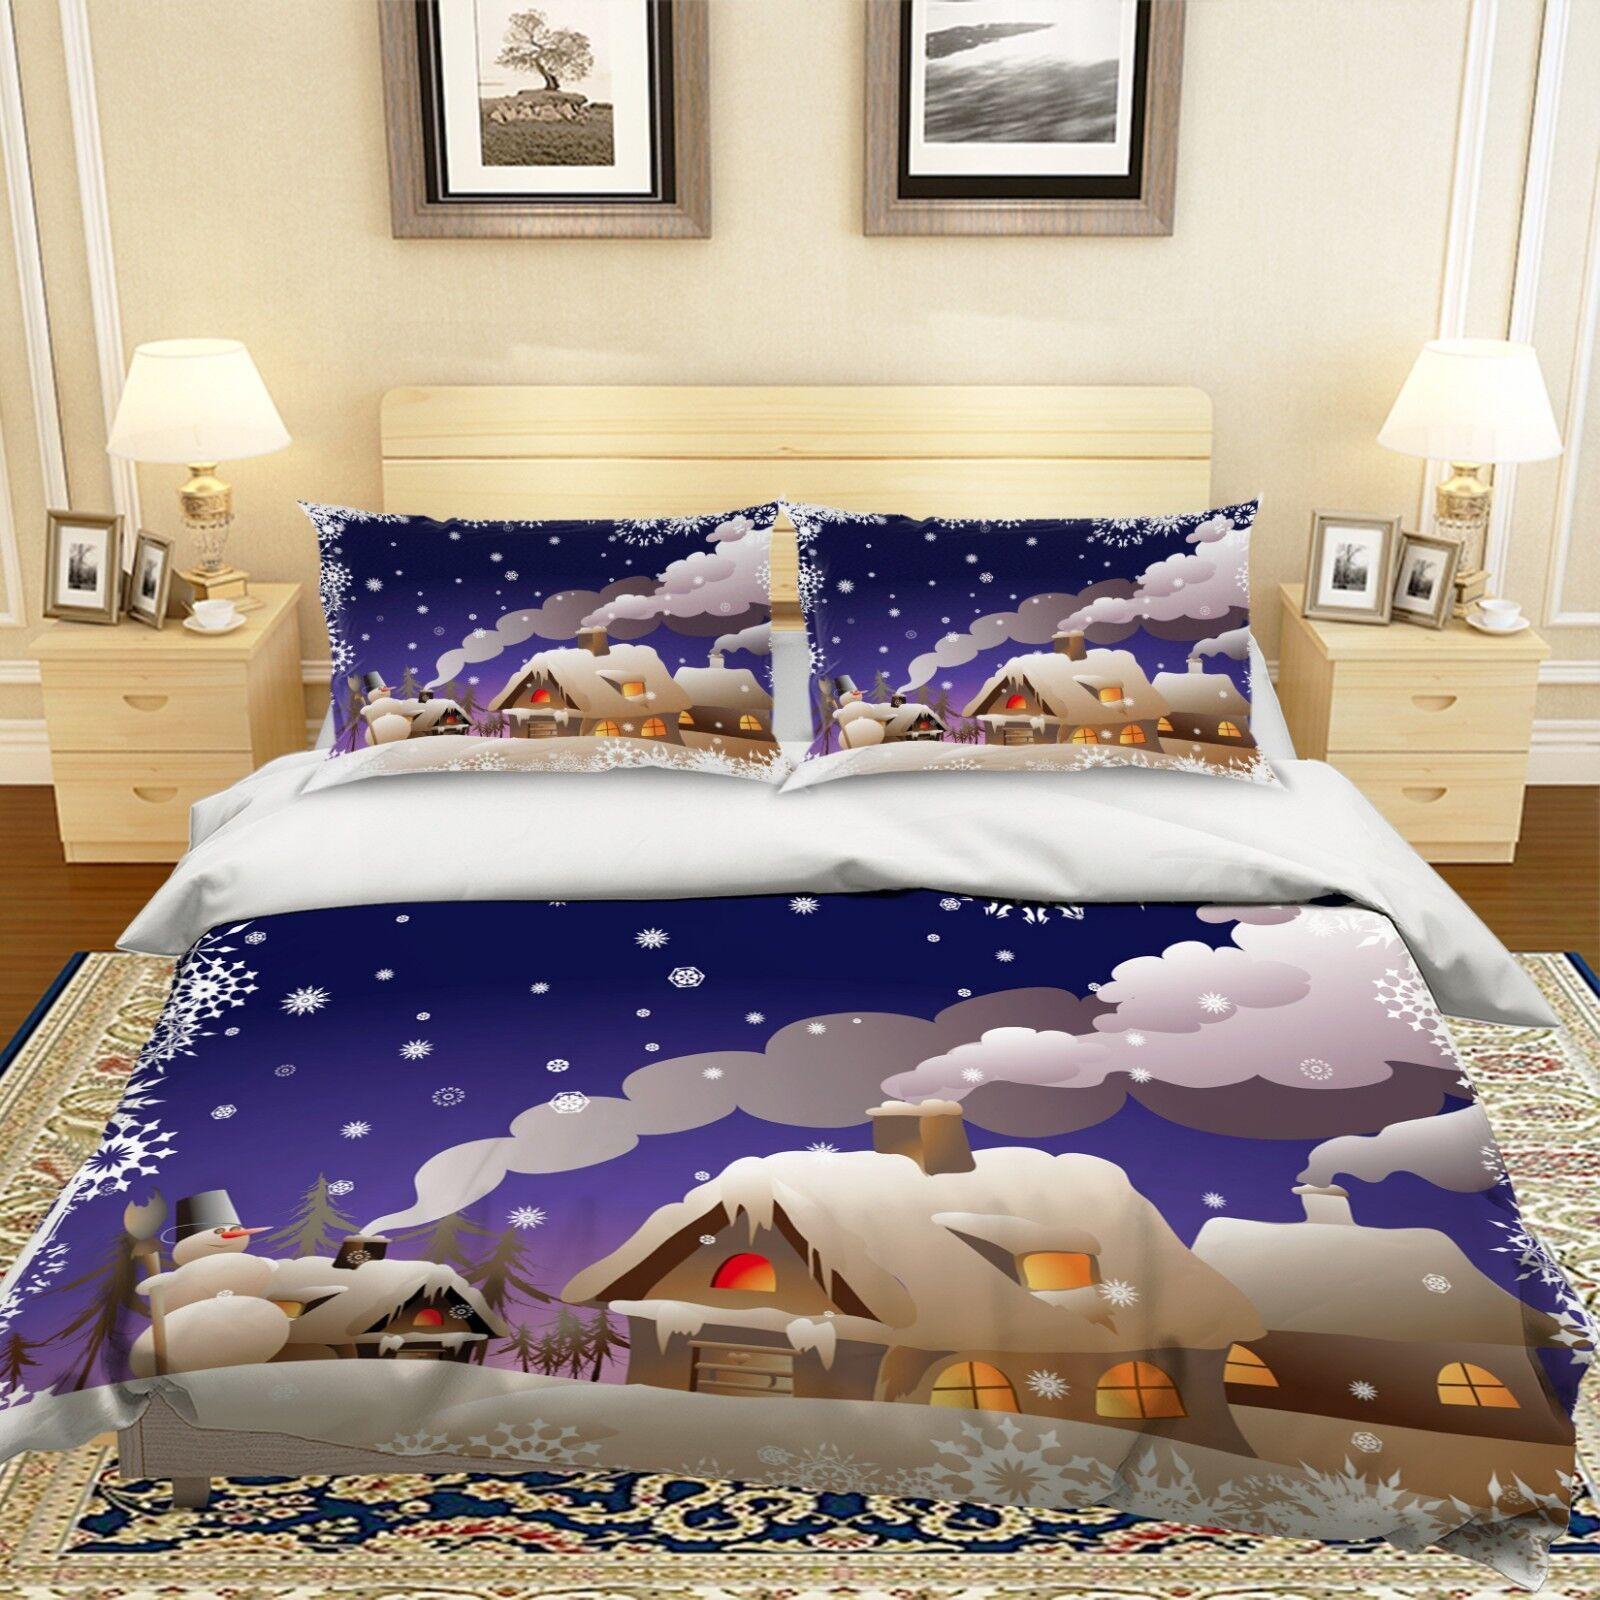 3D Christmas Xmas House 497 Bed Pillowcases Quilt Duvet Cover Set Single KingUK